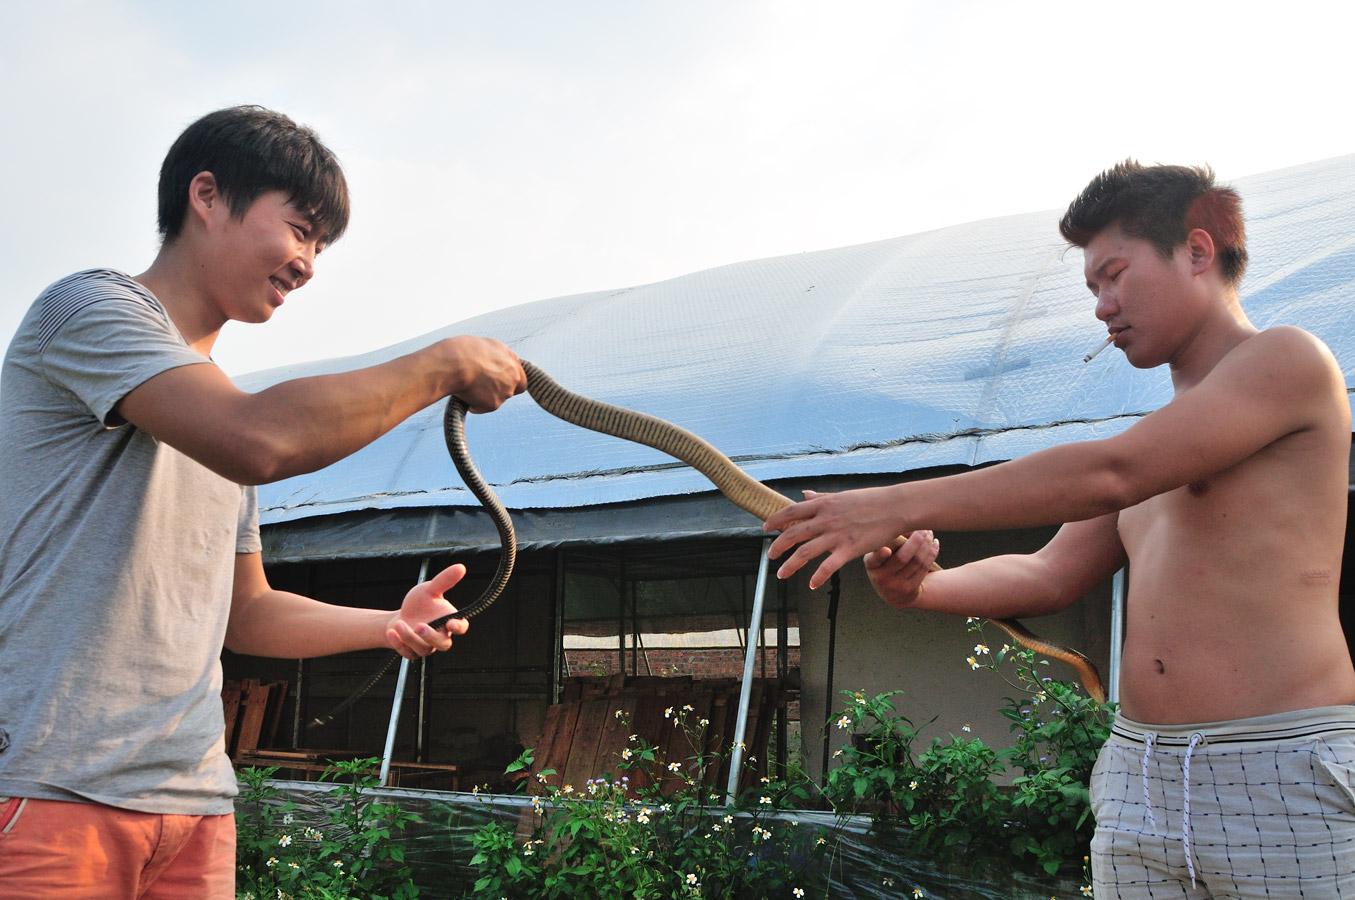 眼鏡王蛇 cobra royal (Ophiophagus hannah) que ces éleveurs, parfaitement décontractés, aident à muer! Guangxi, Chine 2017 ©AYMERICH Michel